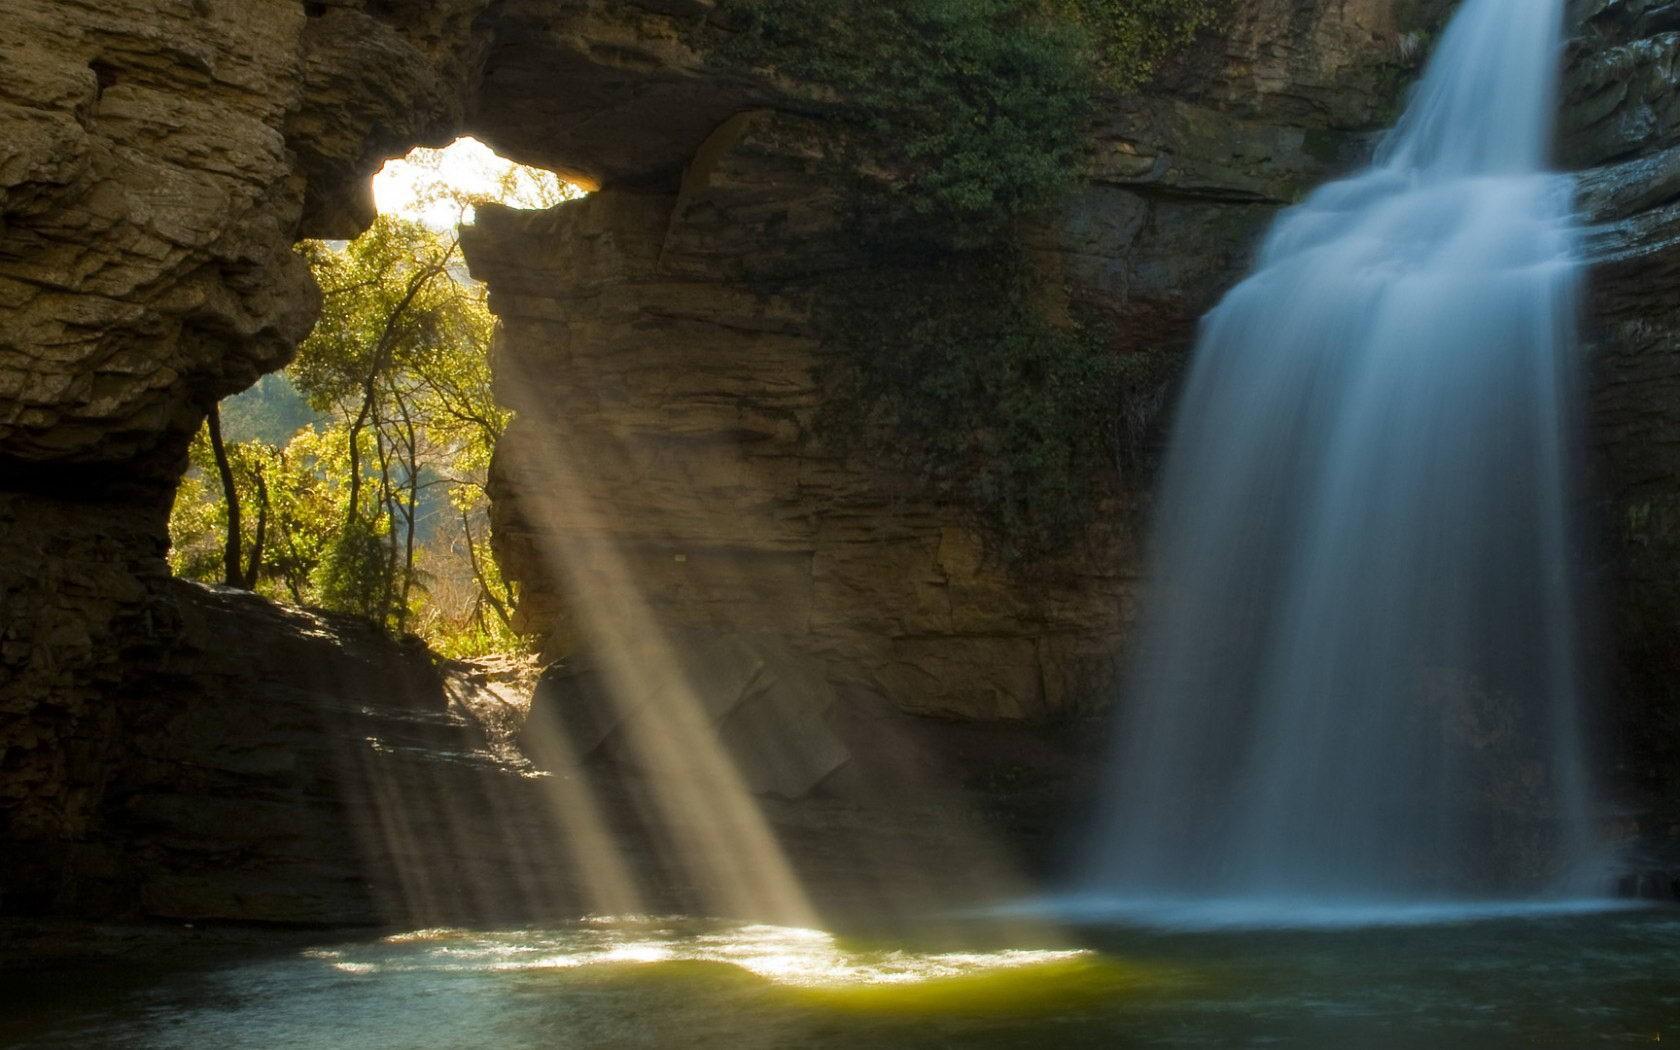 Nature Cave Wallpaper 1680x1050 Nature Cave Rocks Sunlight 1680x1050